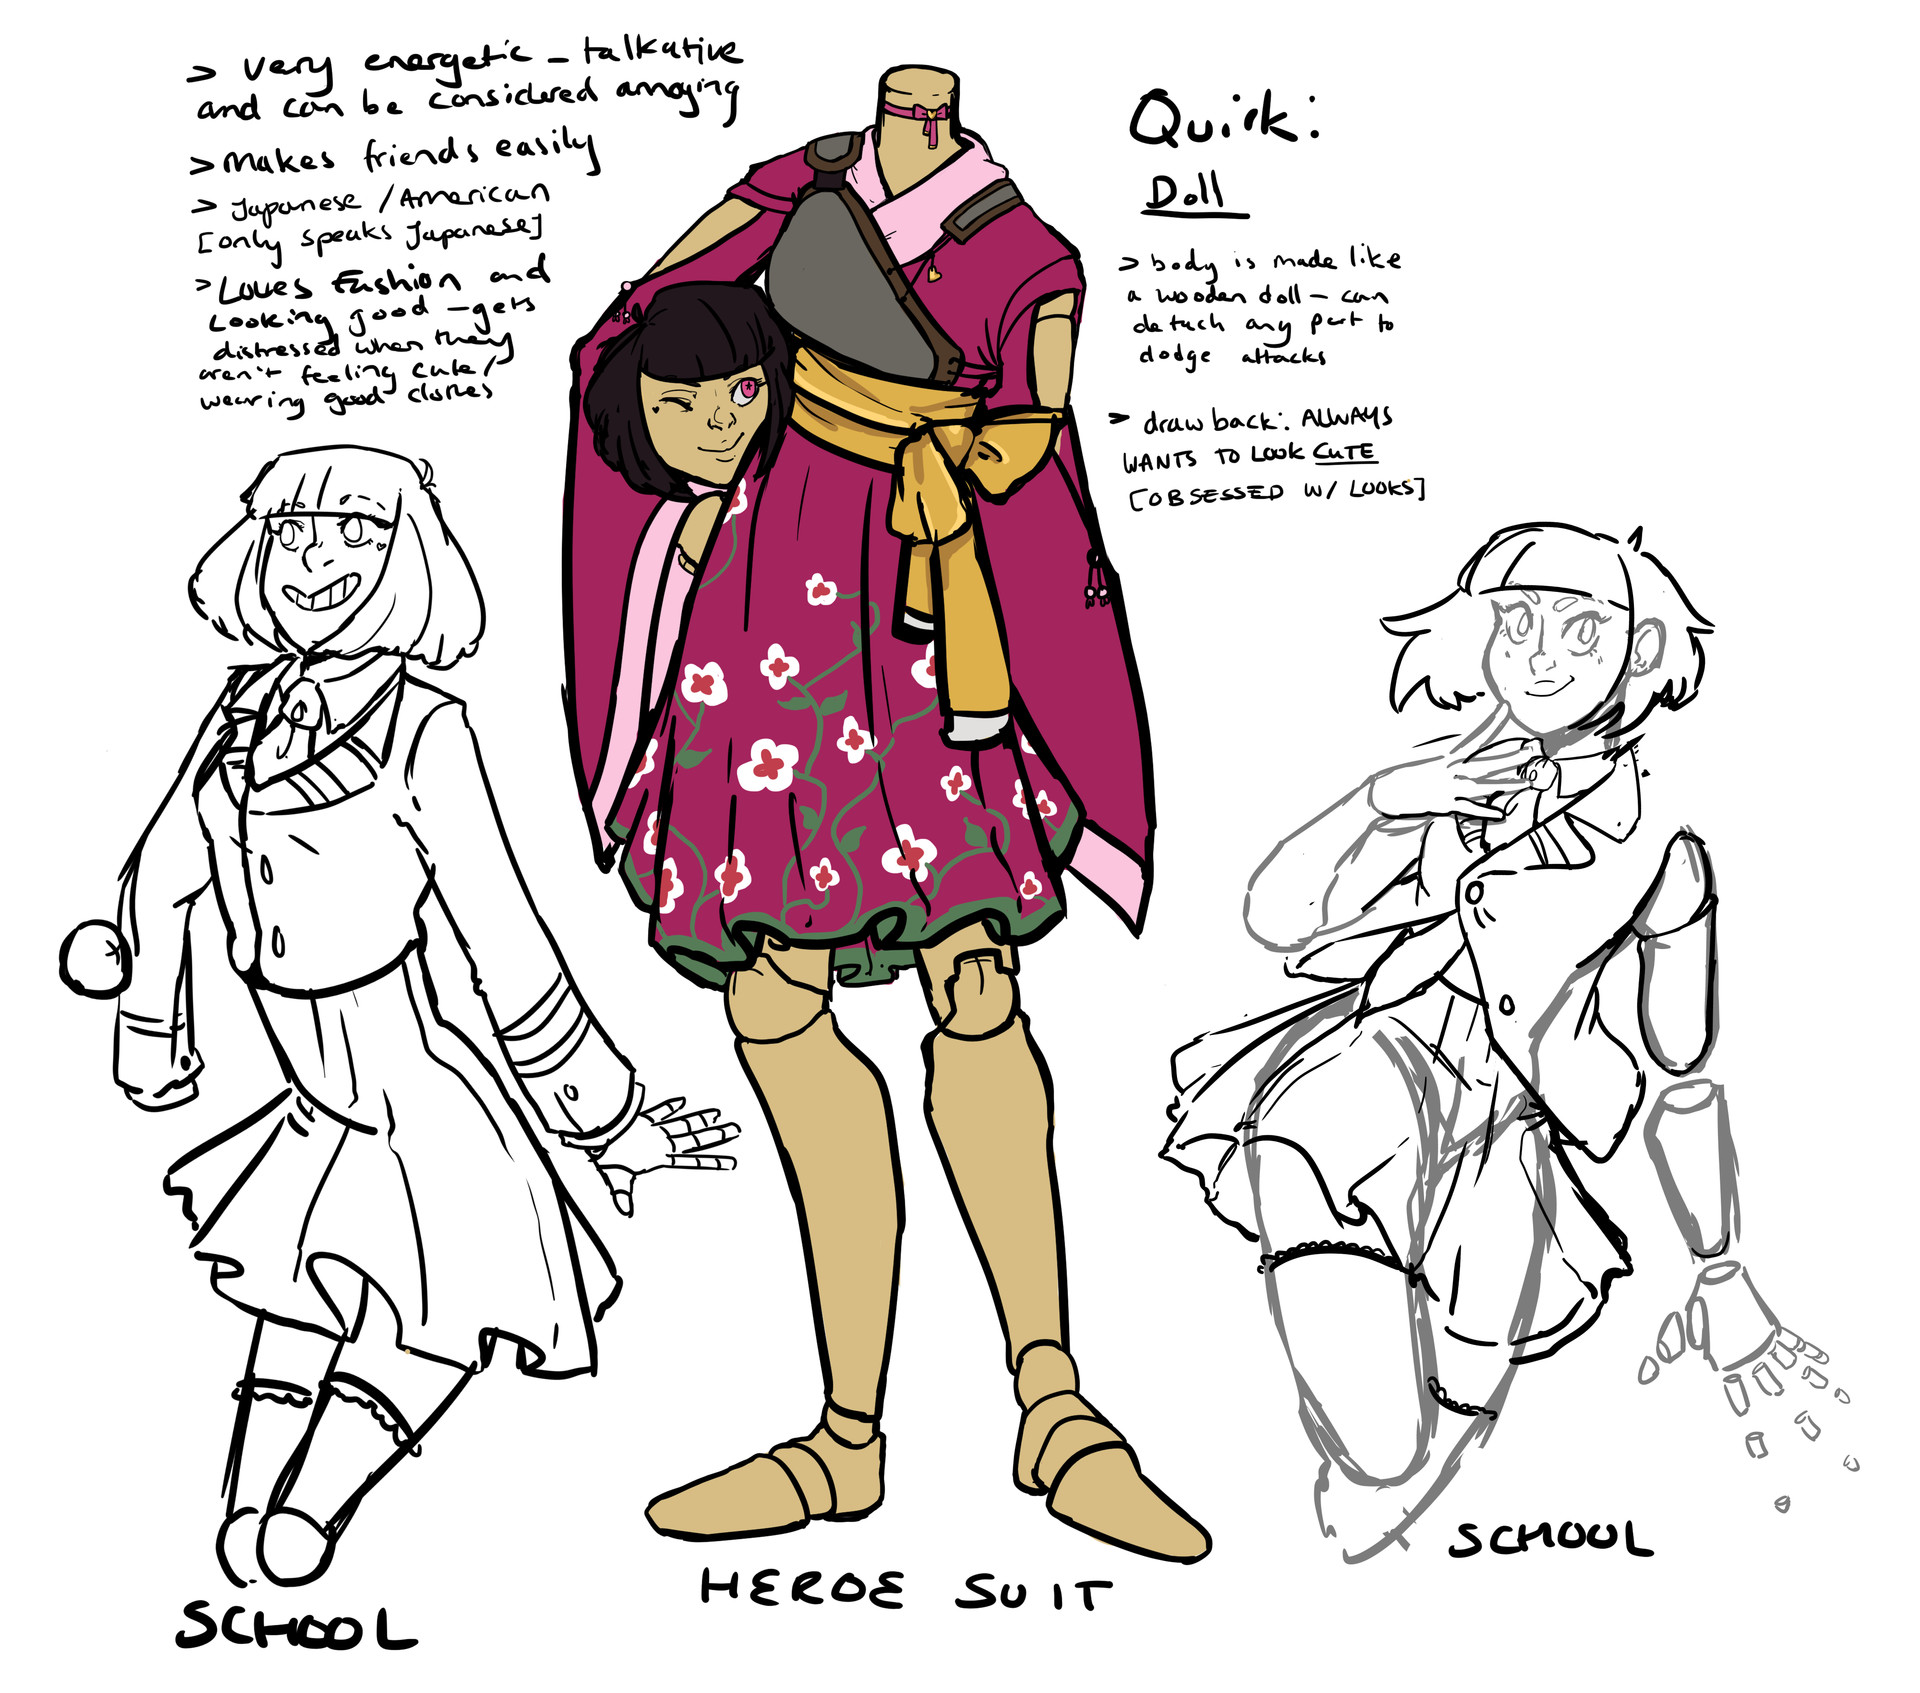 ArtStation - Orginal Character Concept Sheets, Joel Tasker